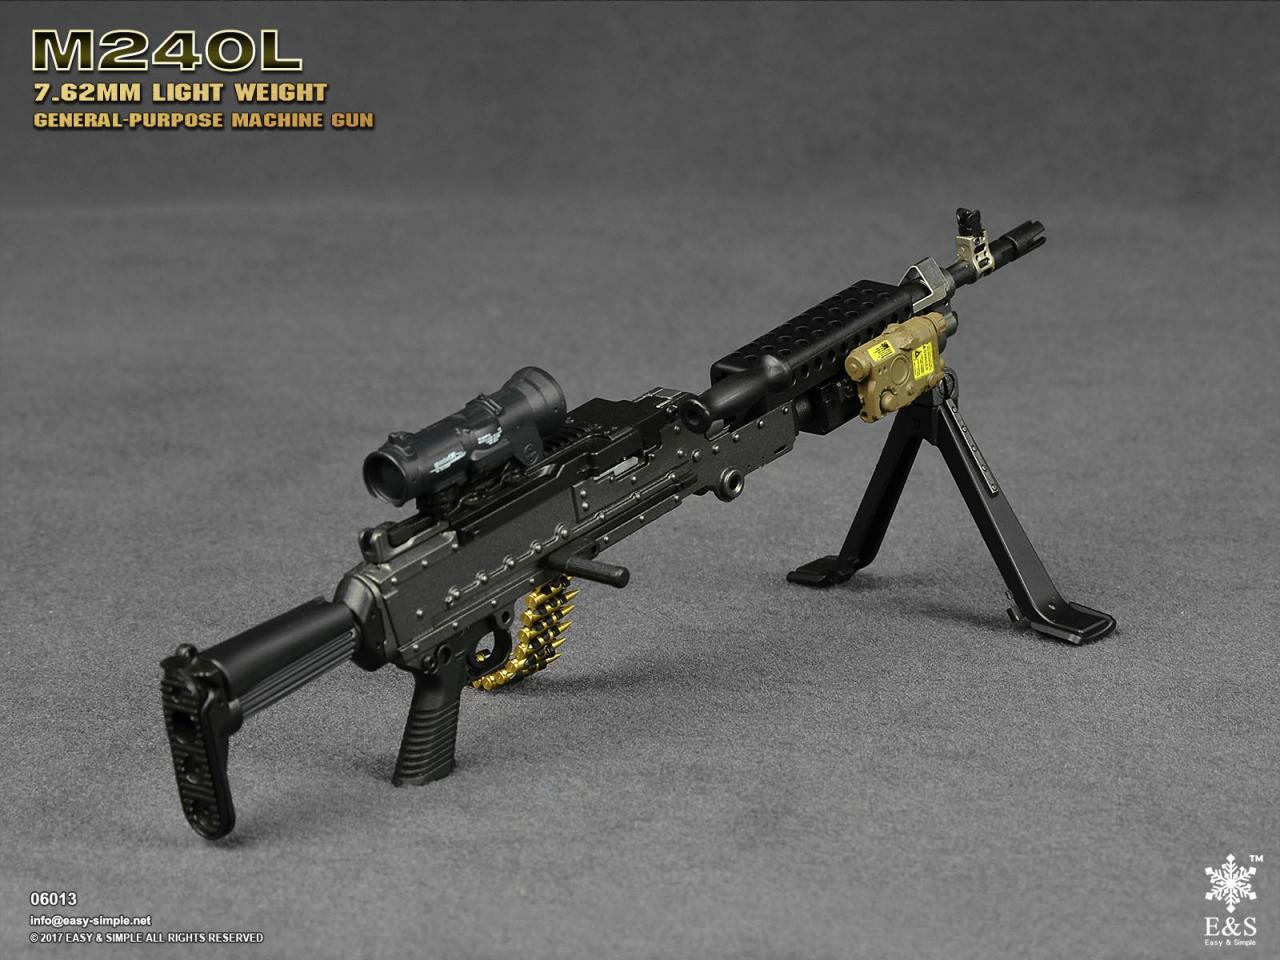 Easy&Simple 06013 M240L 7.62mm Light Weight General Purpose Machine Gun-06013-7-jpg